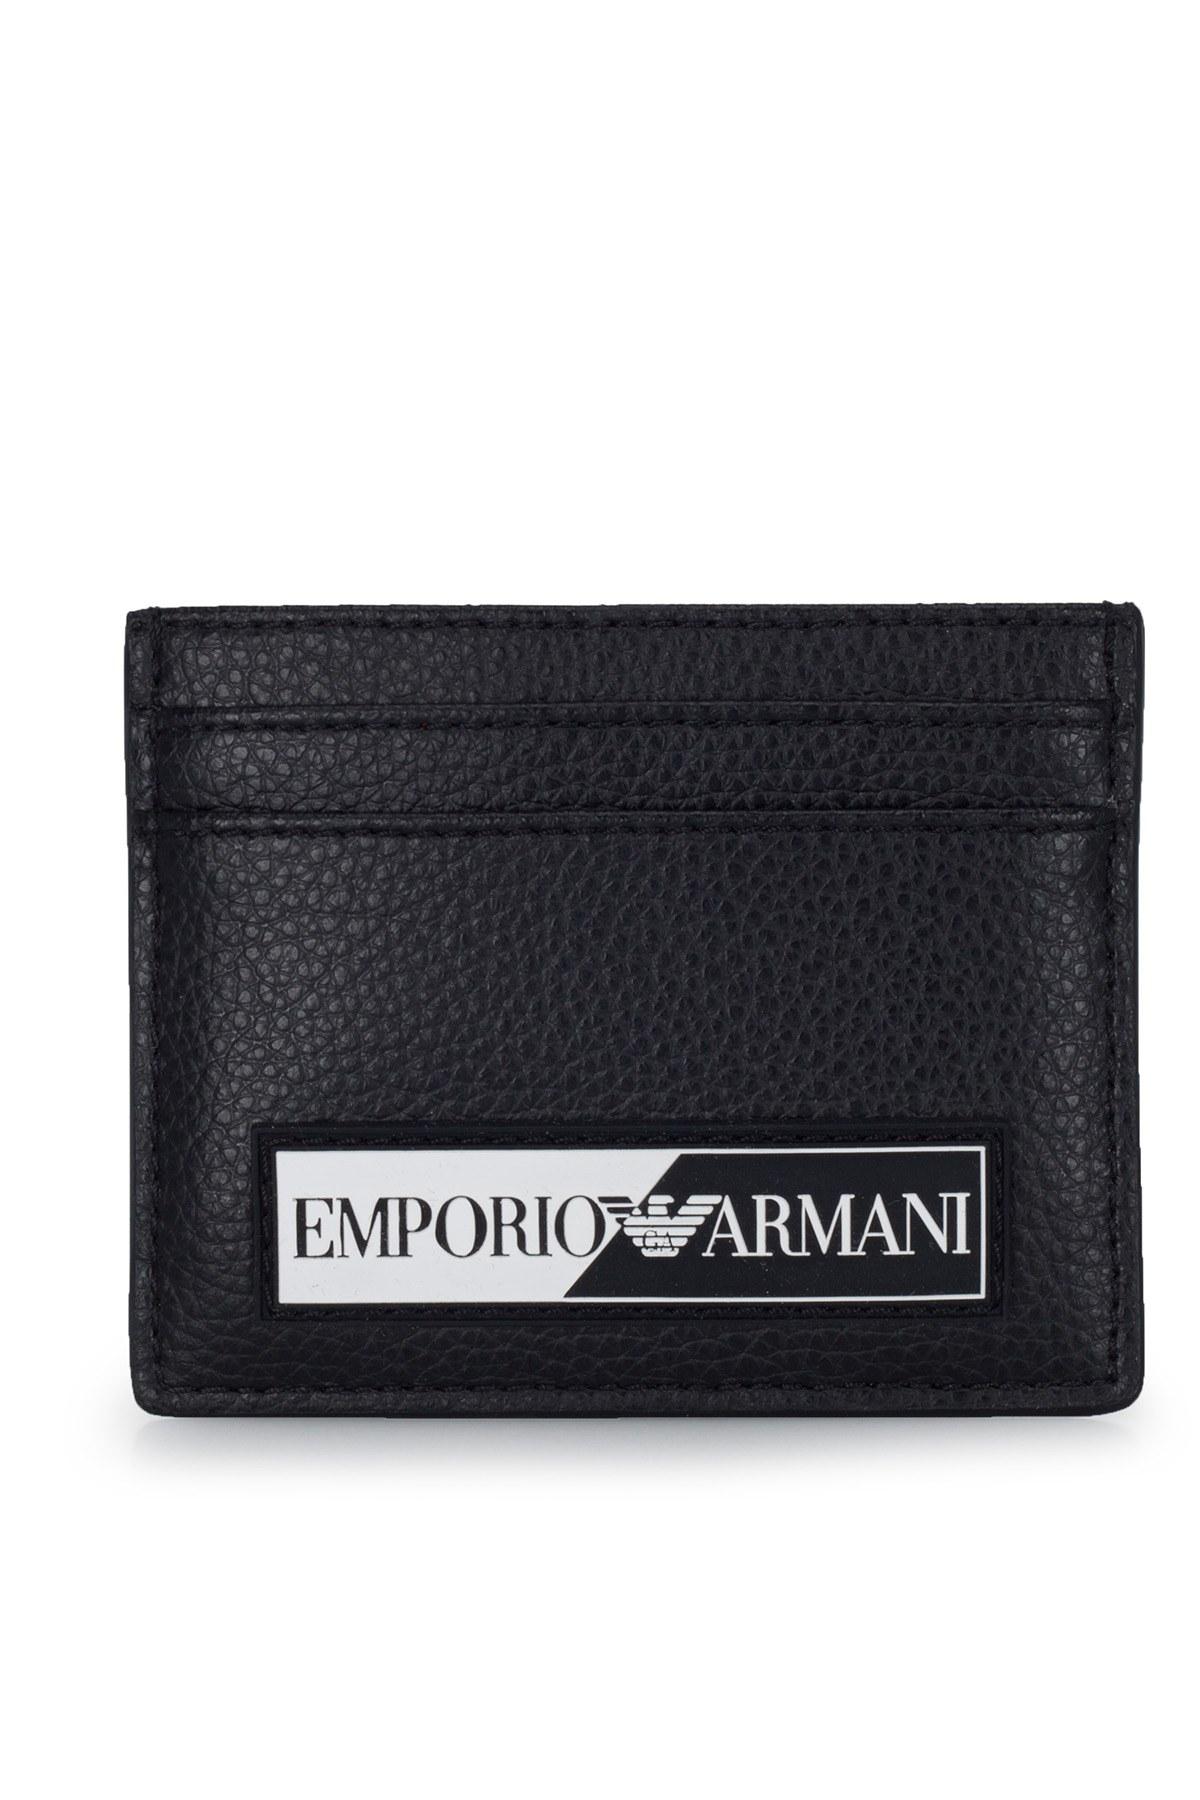 Emporio Armani Logo Baskılı Erkek Kartlık Y4R168 YTA2J 81072 SİYAH